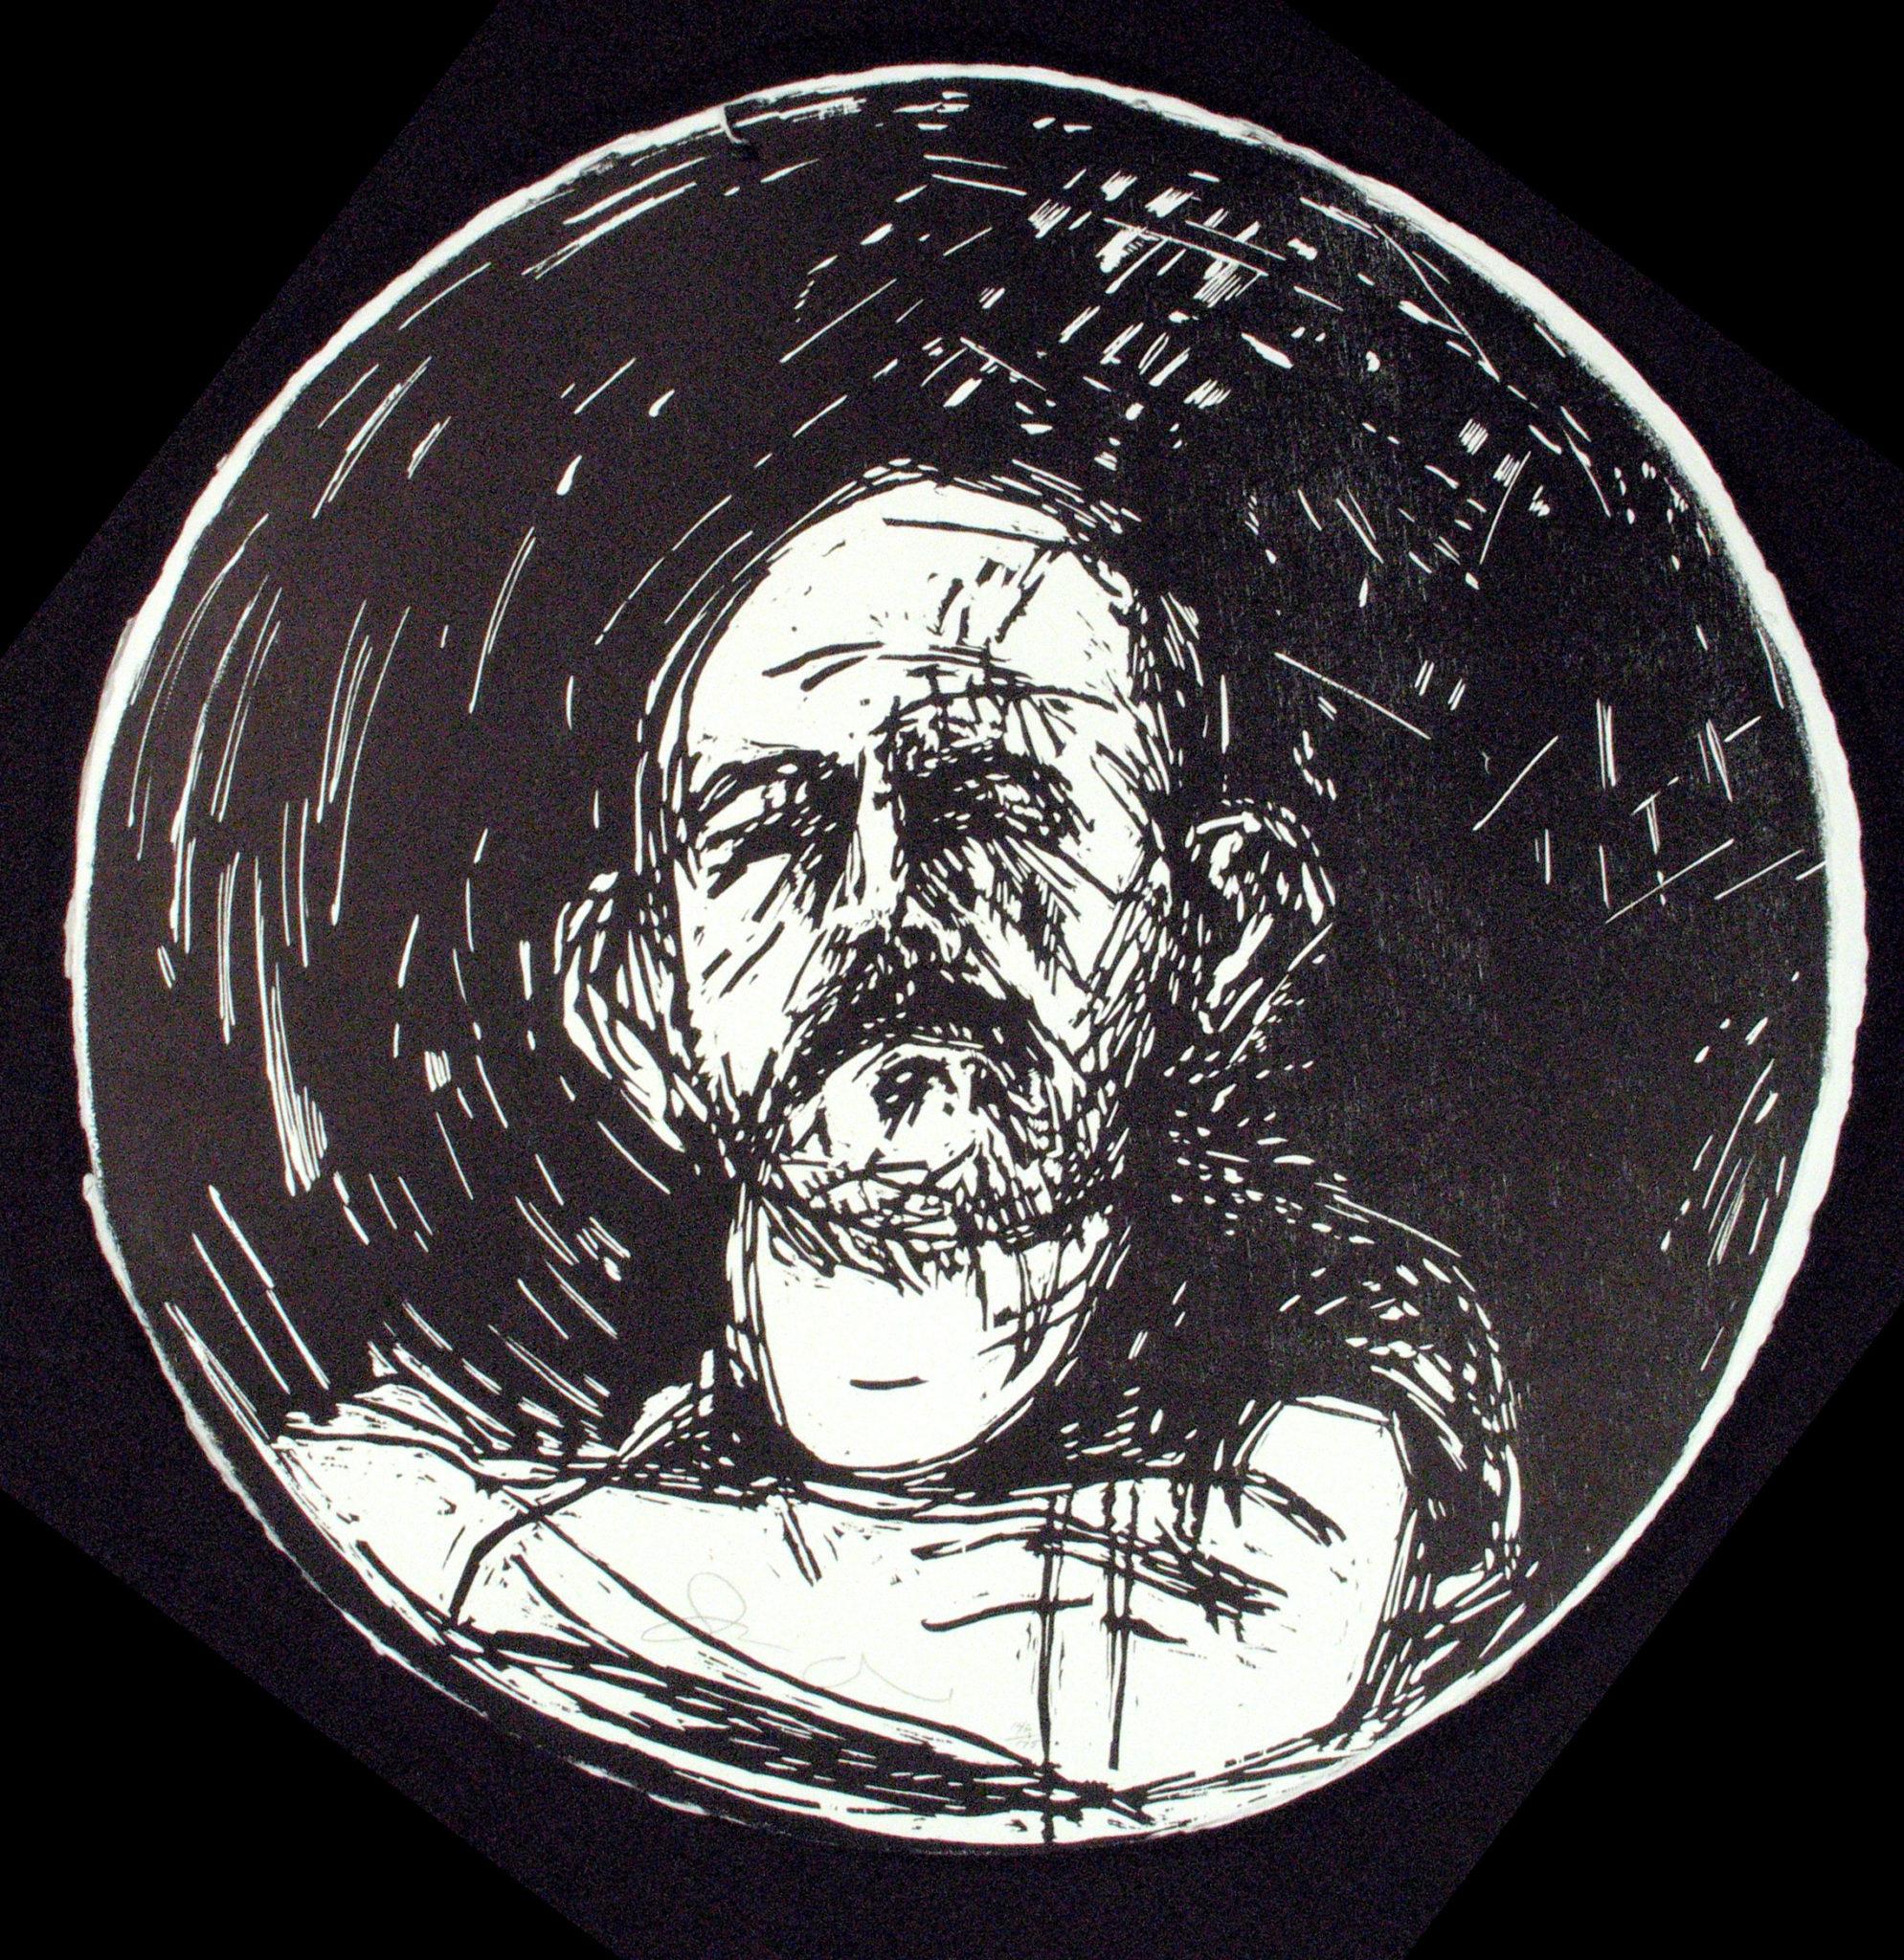 portrait of John Ashbery